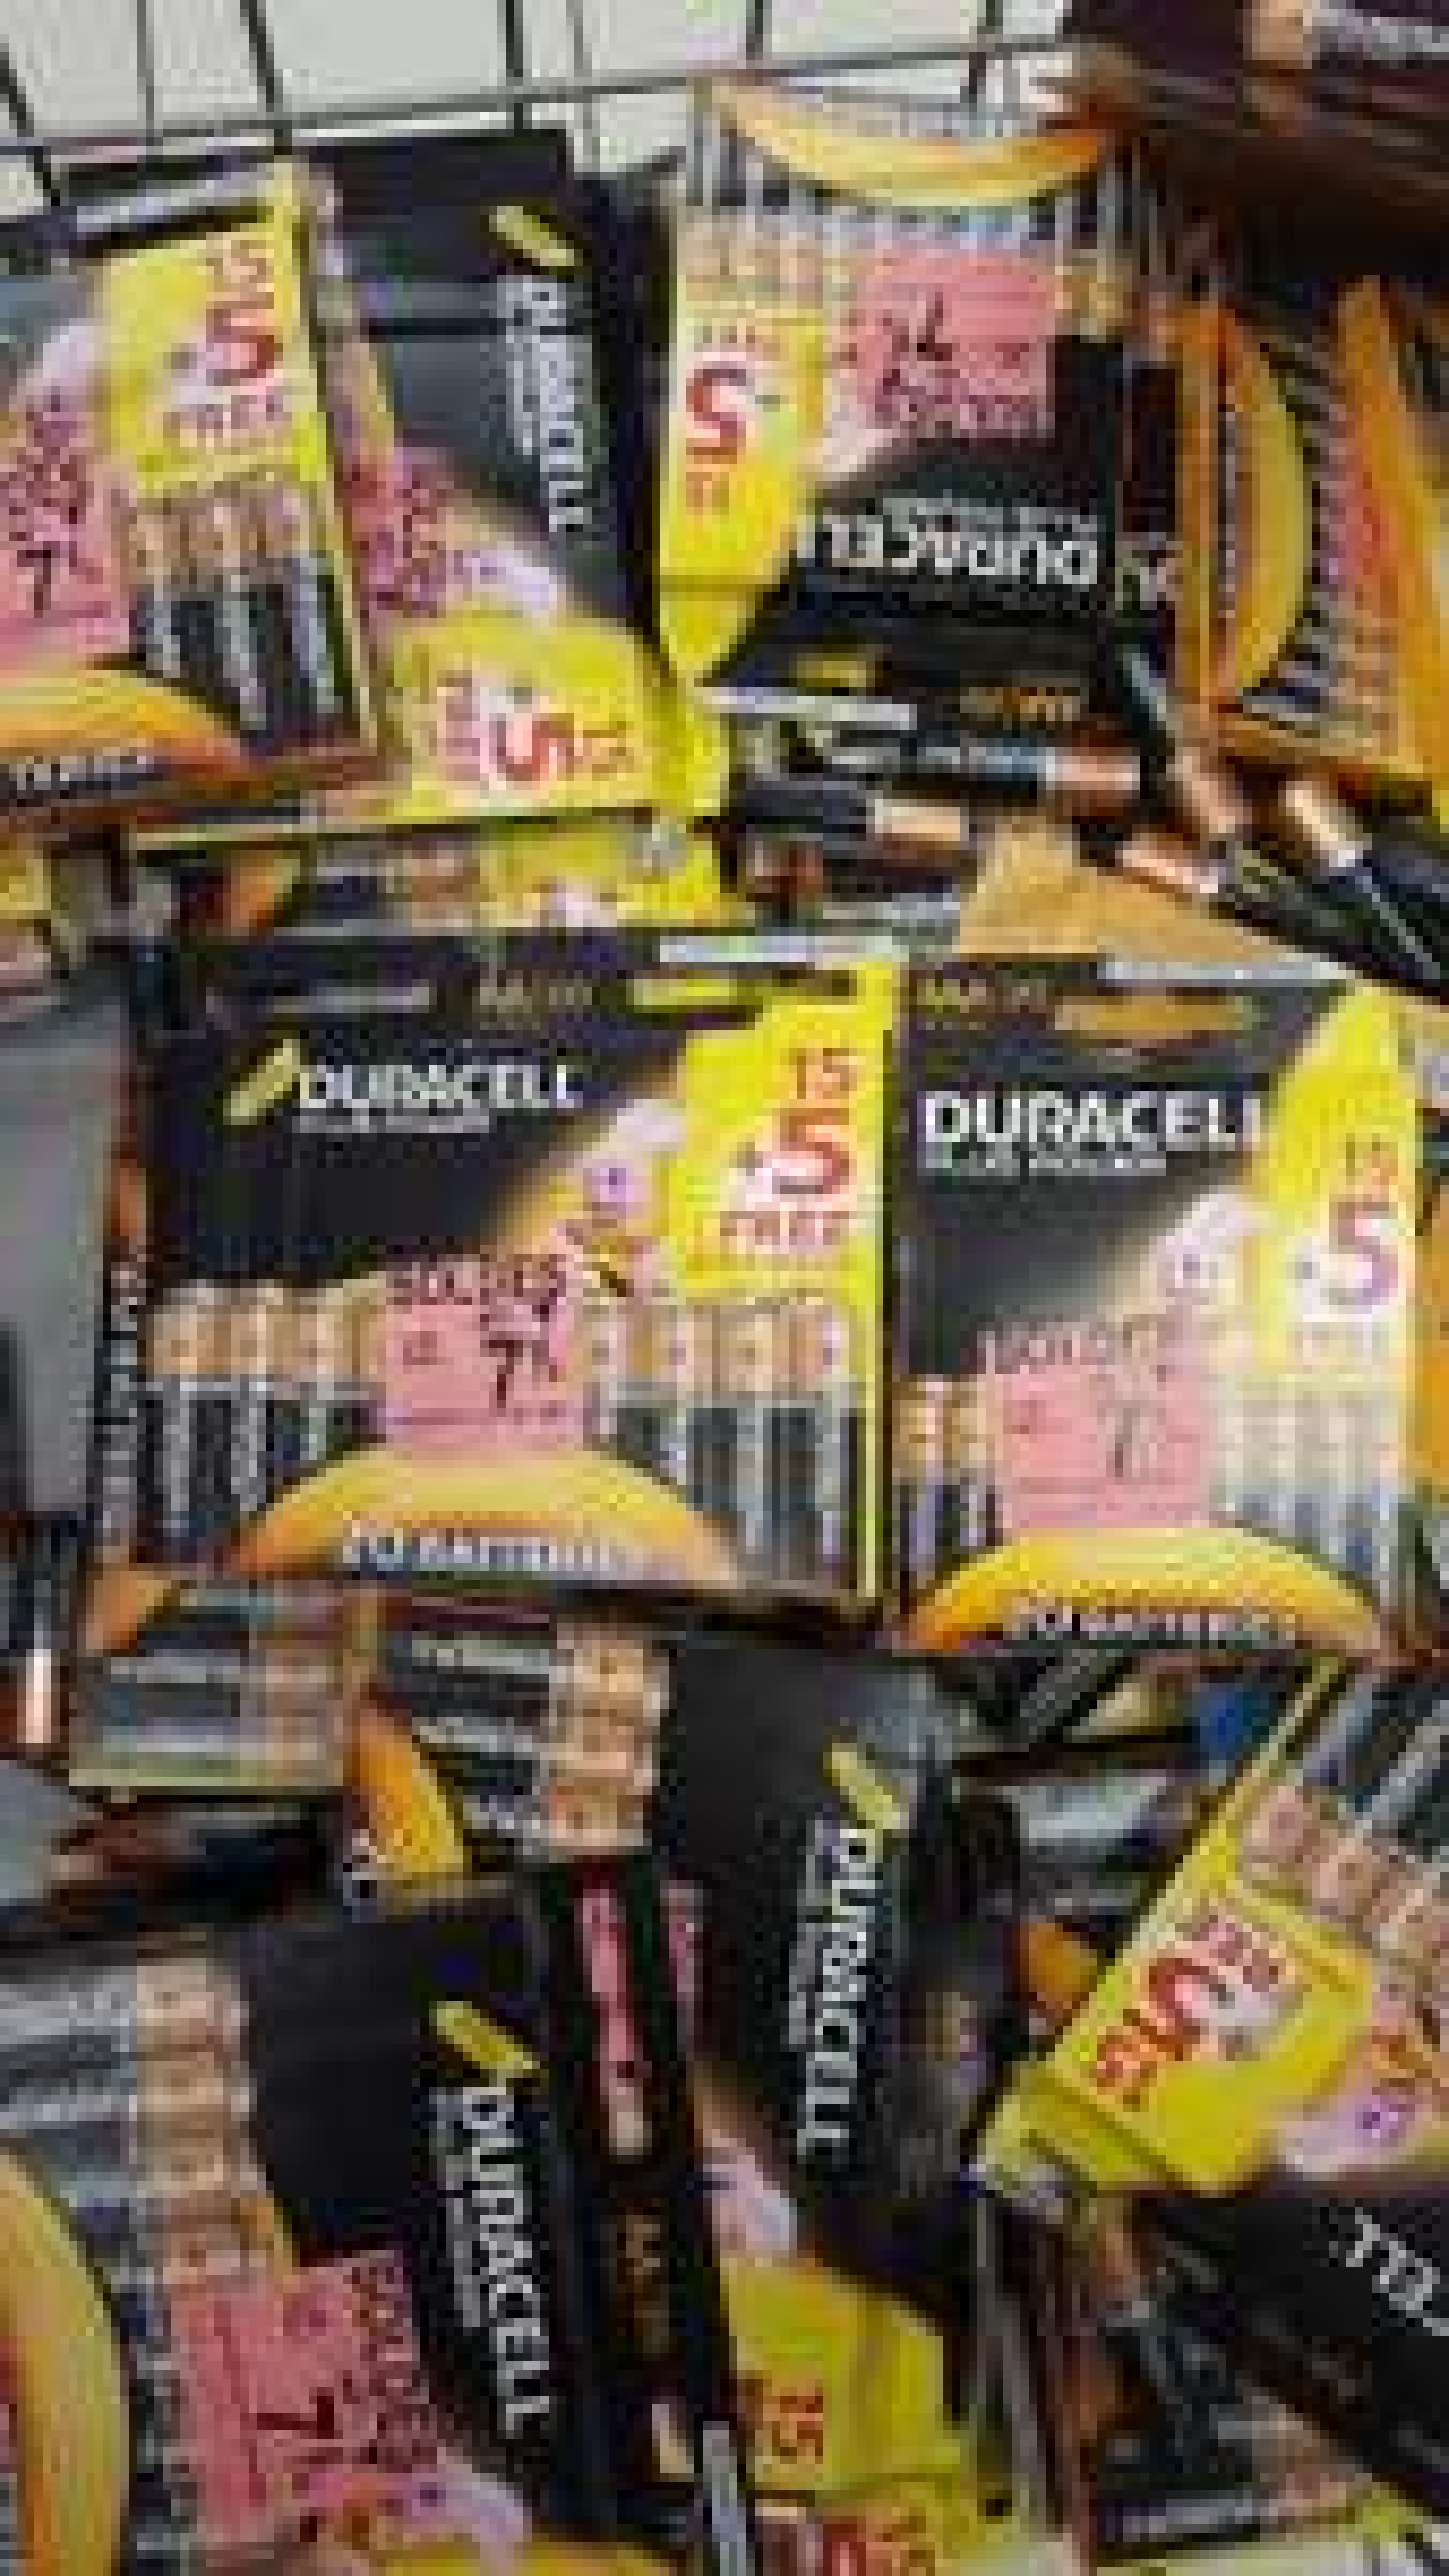 Lot de 20 piles Duracell Plus Power AAA ou AA